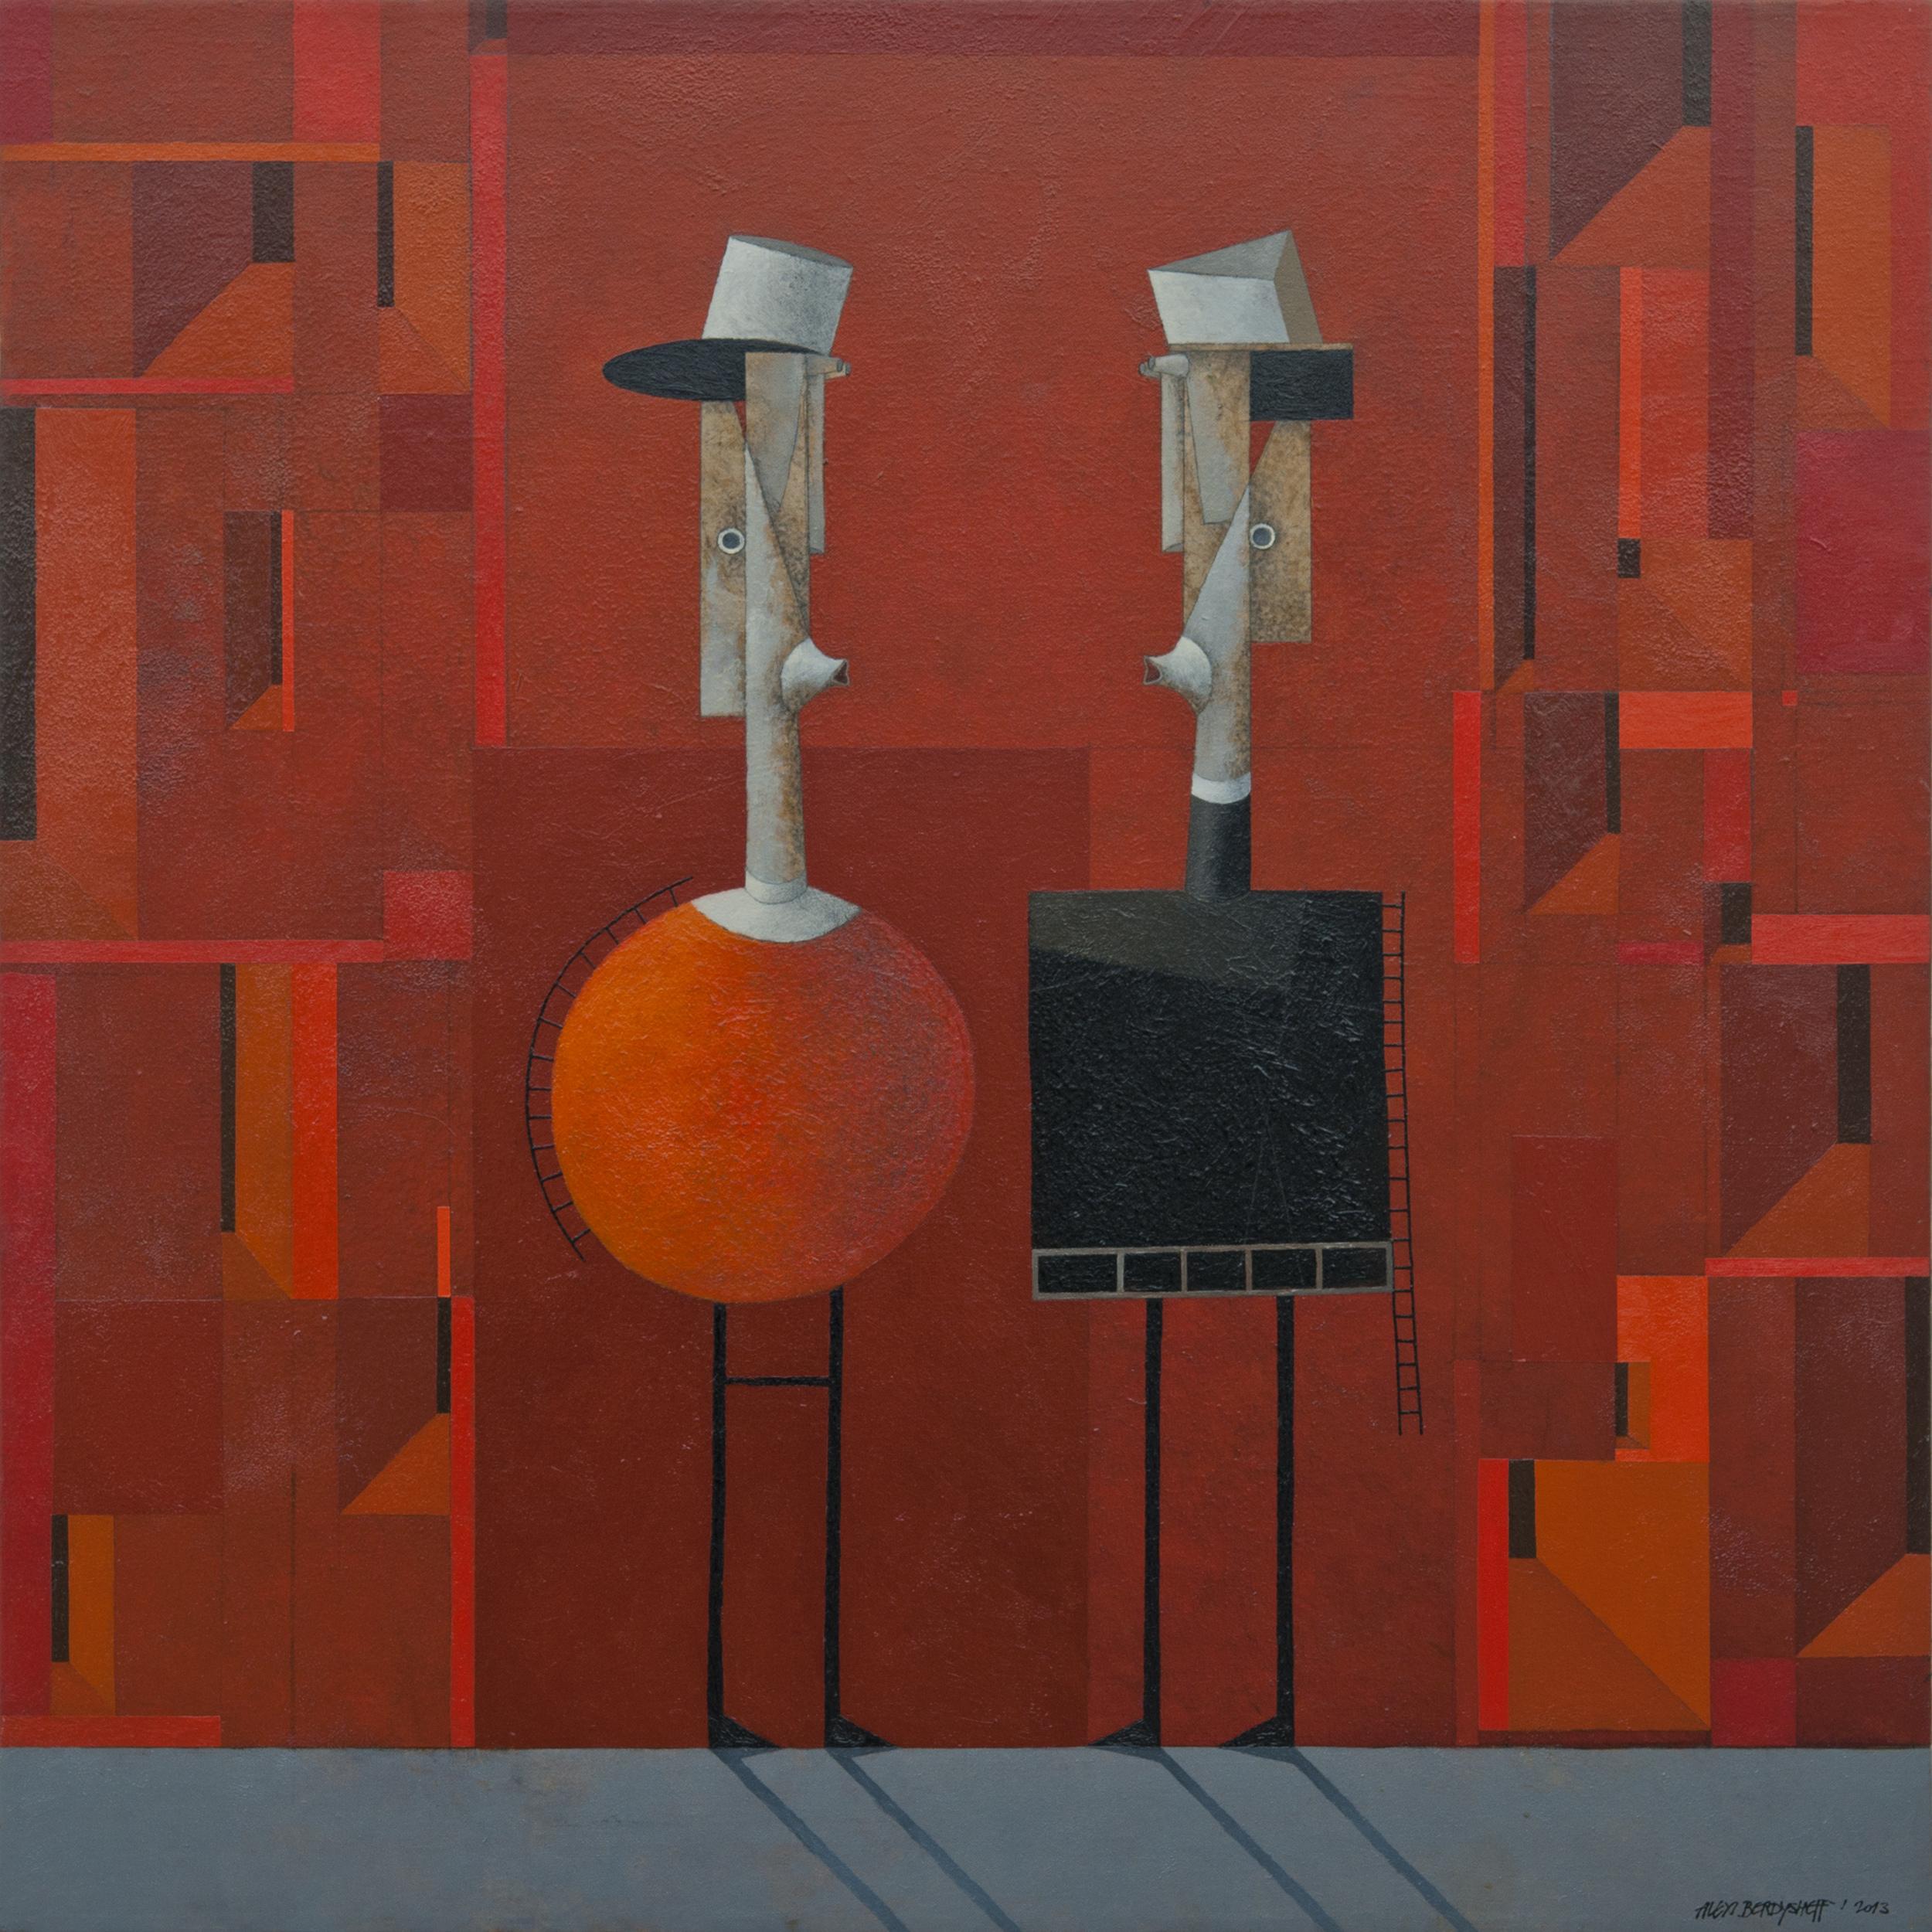 Industrial Romance II, oil on canvas, 85x85 cm, 2013